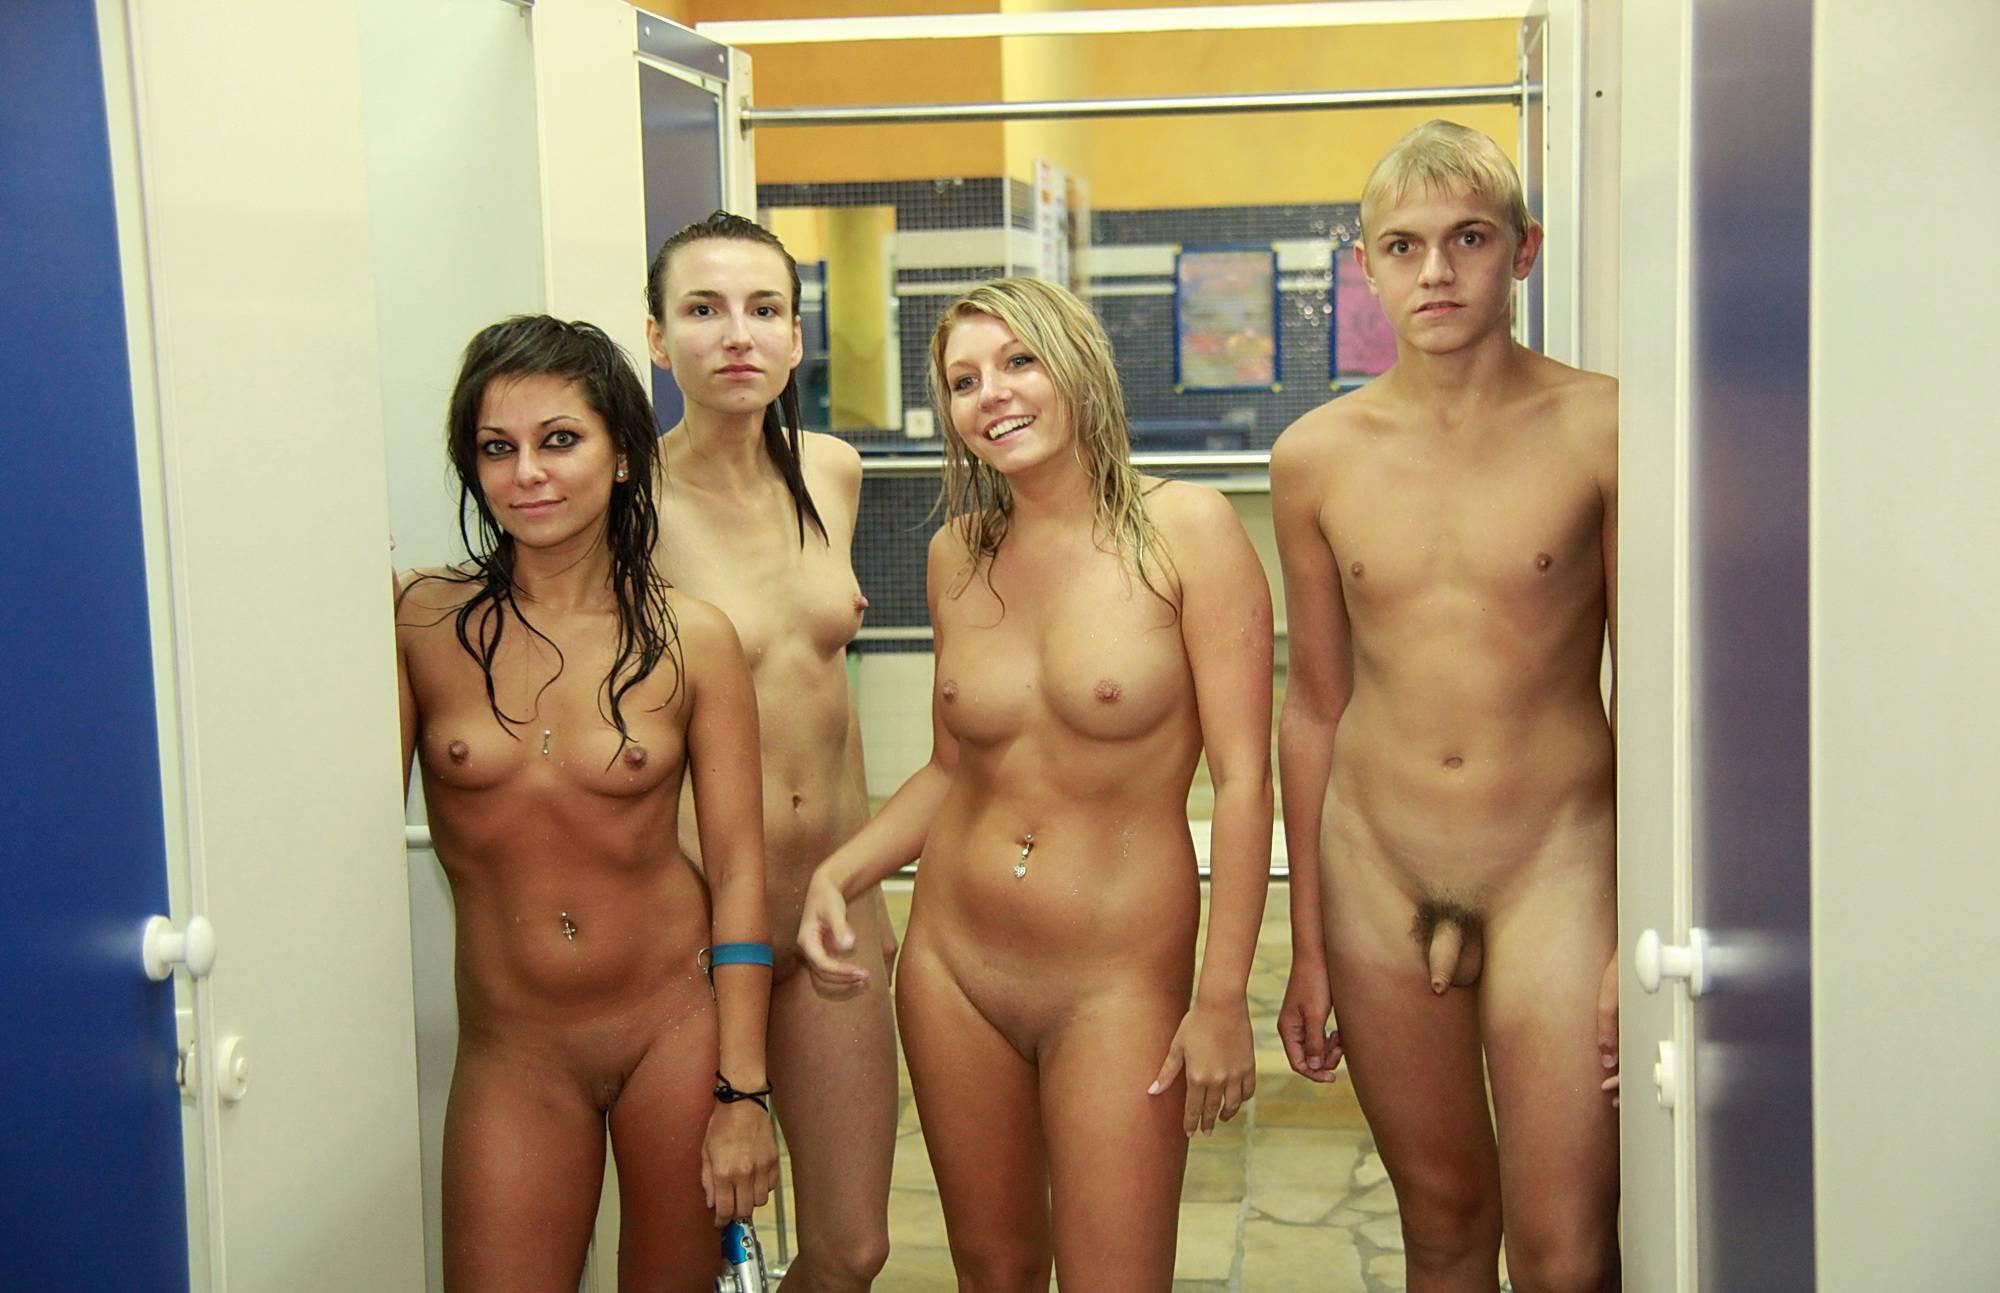 Purenudism Pics Shower Room Adventures - 3